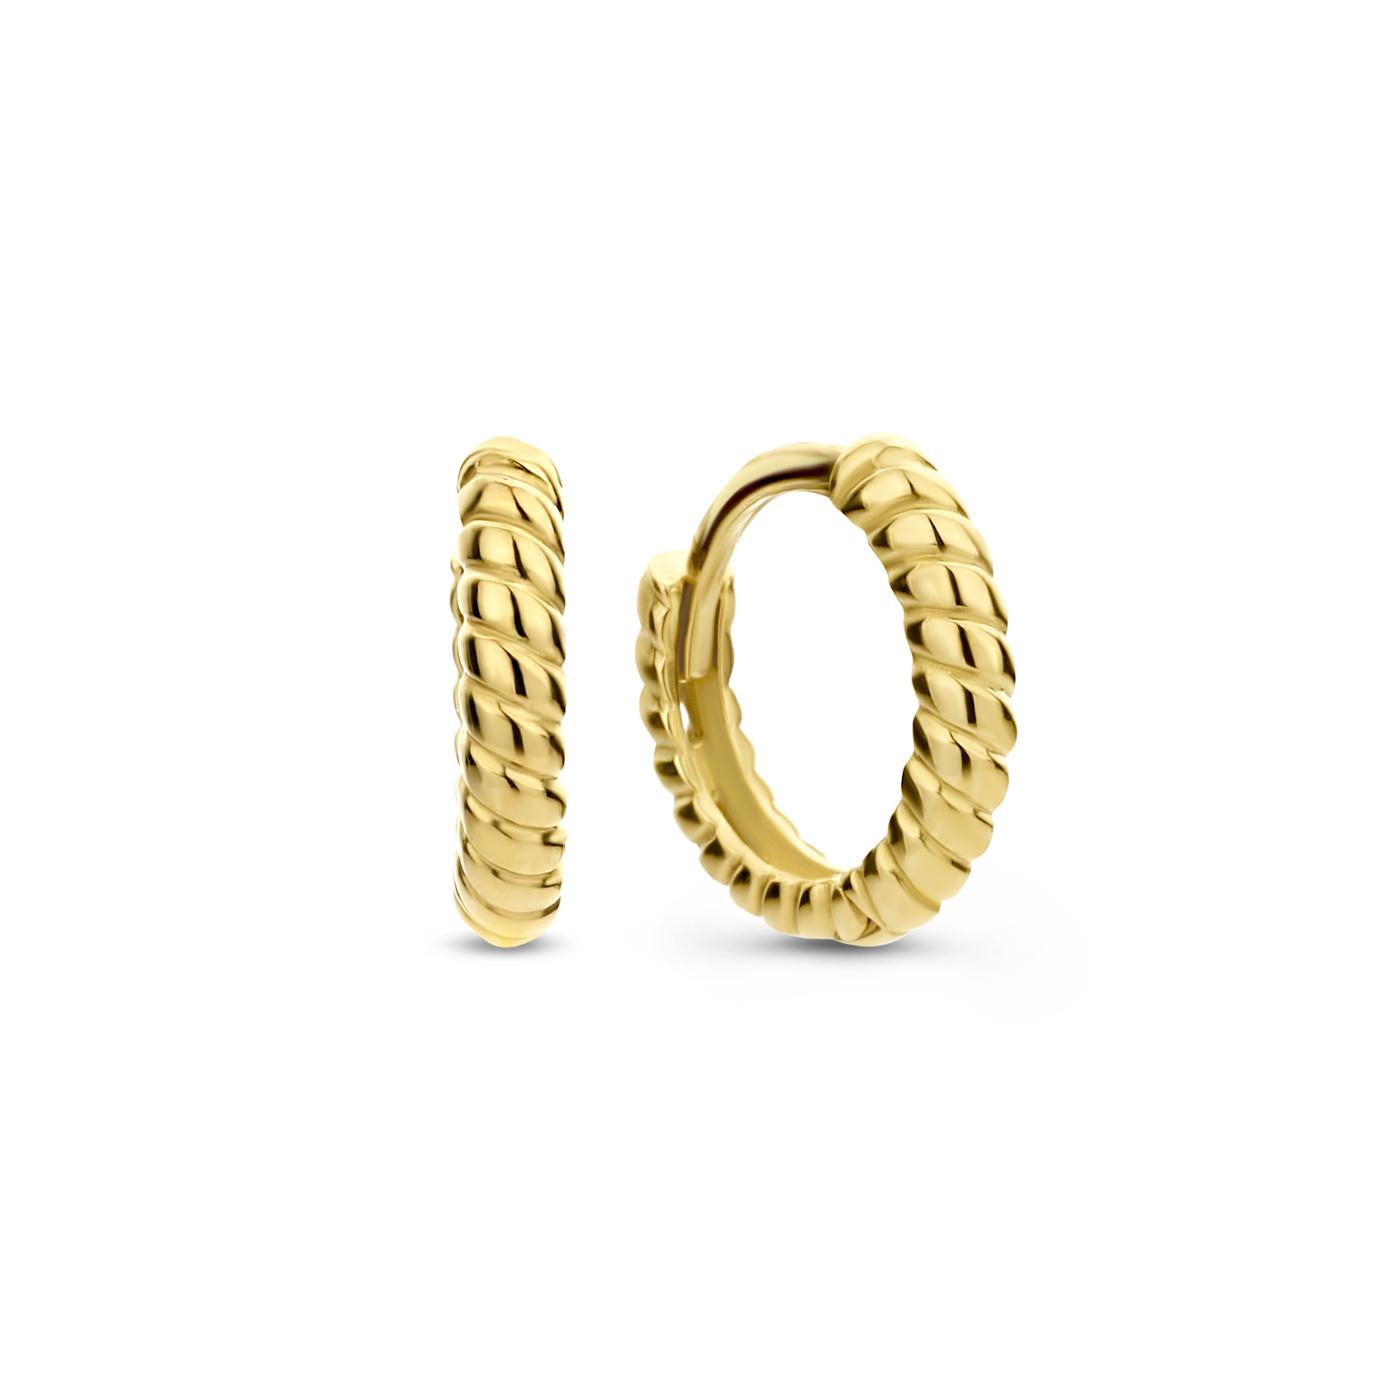 Isabel Bernard Le Marais Anne-Colette 585er Goldkreolen